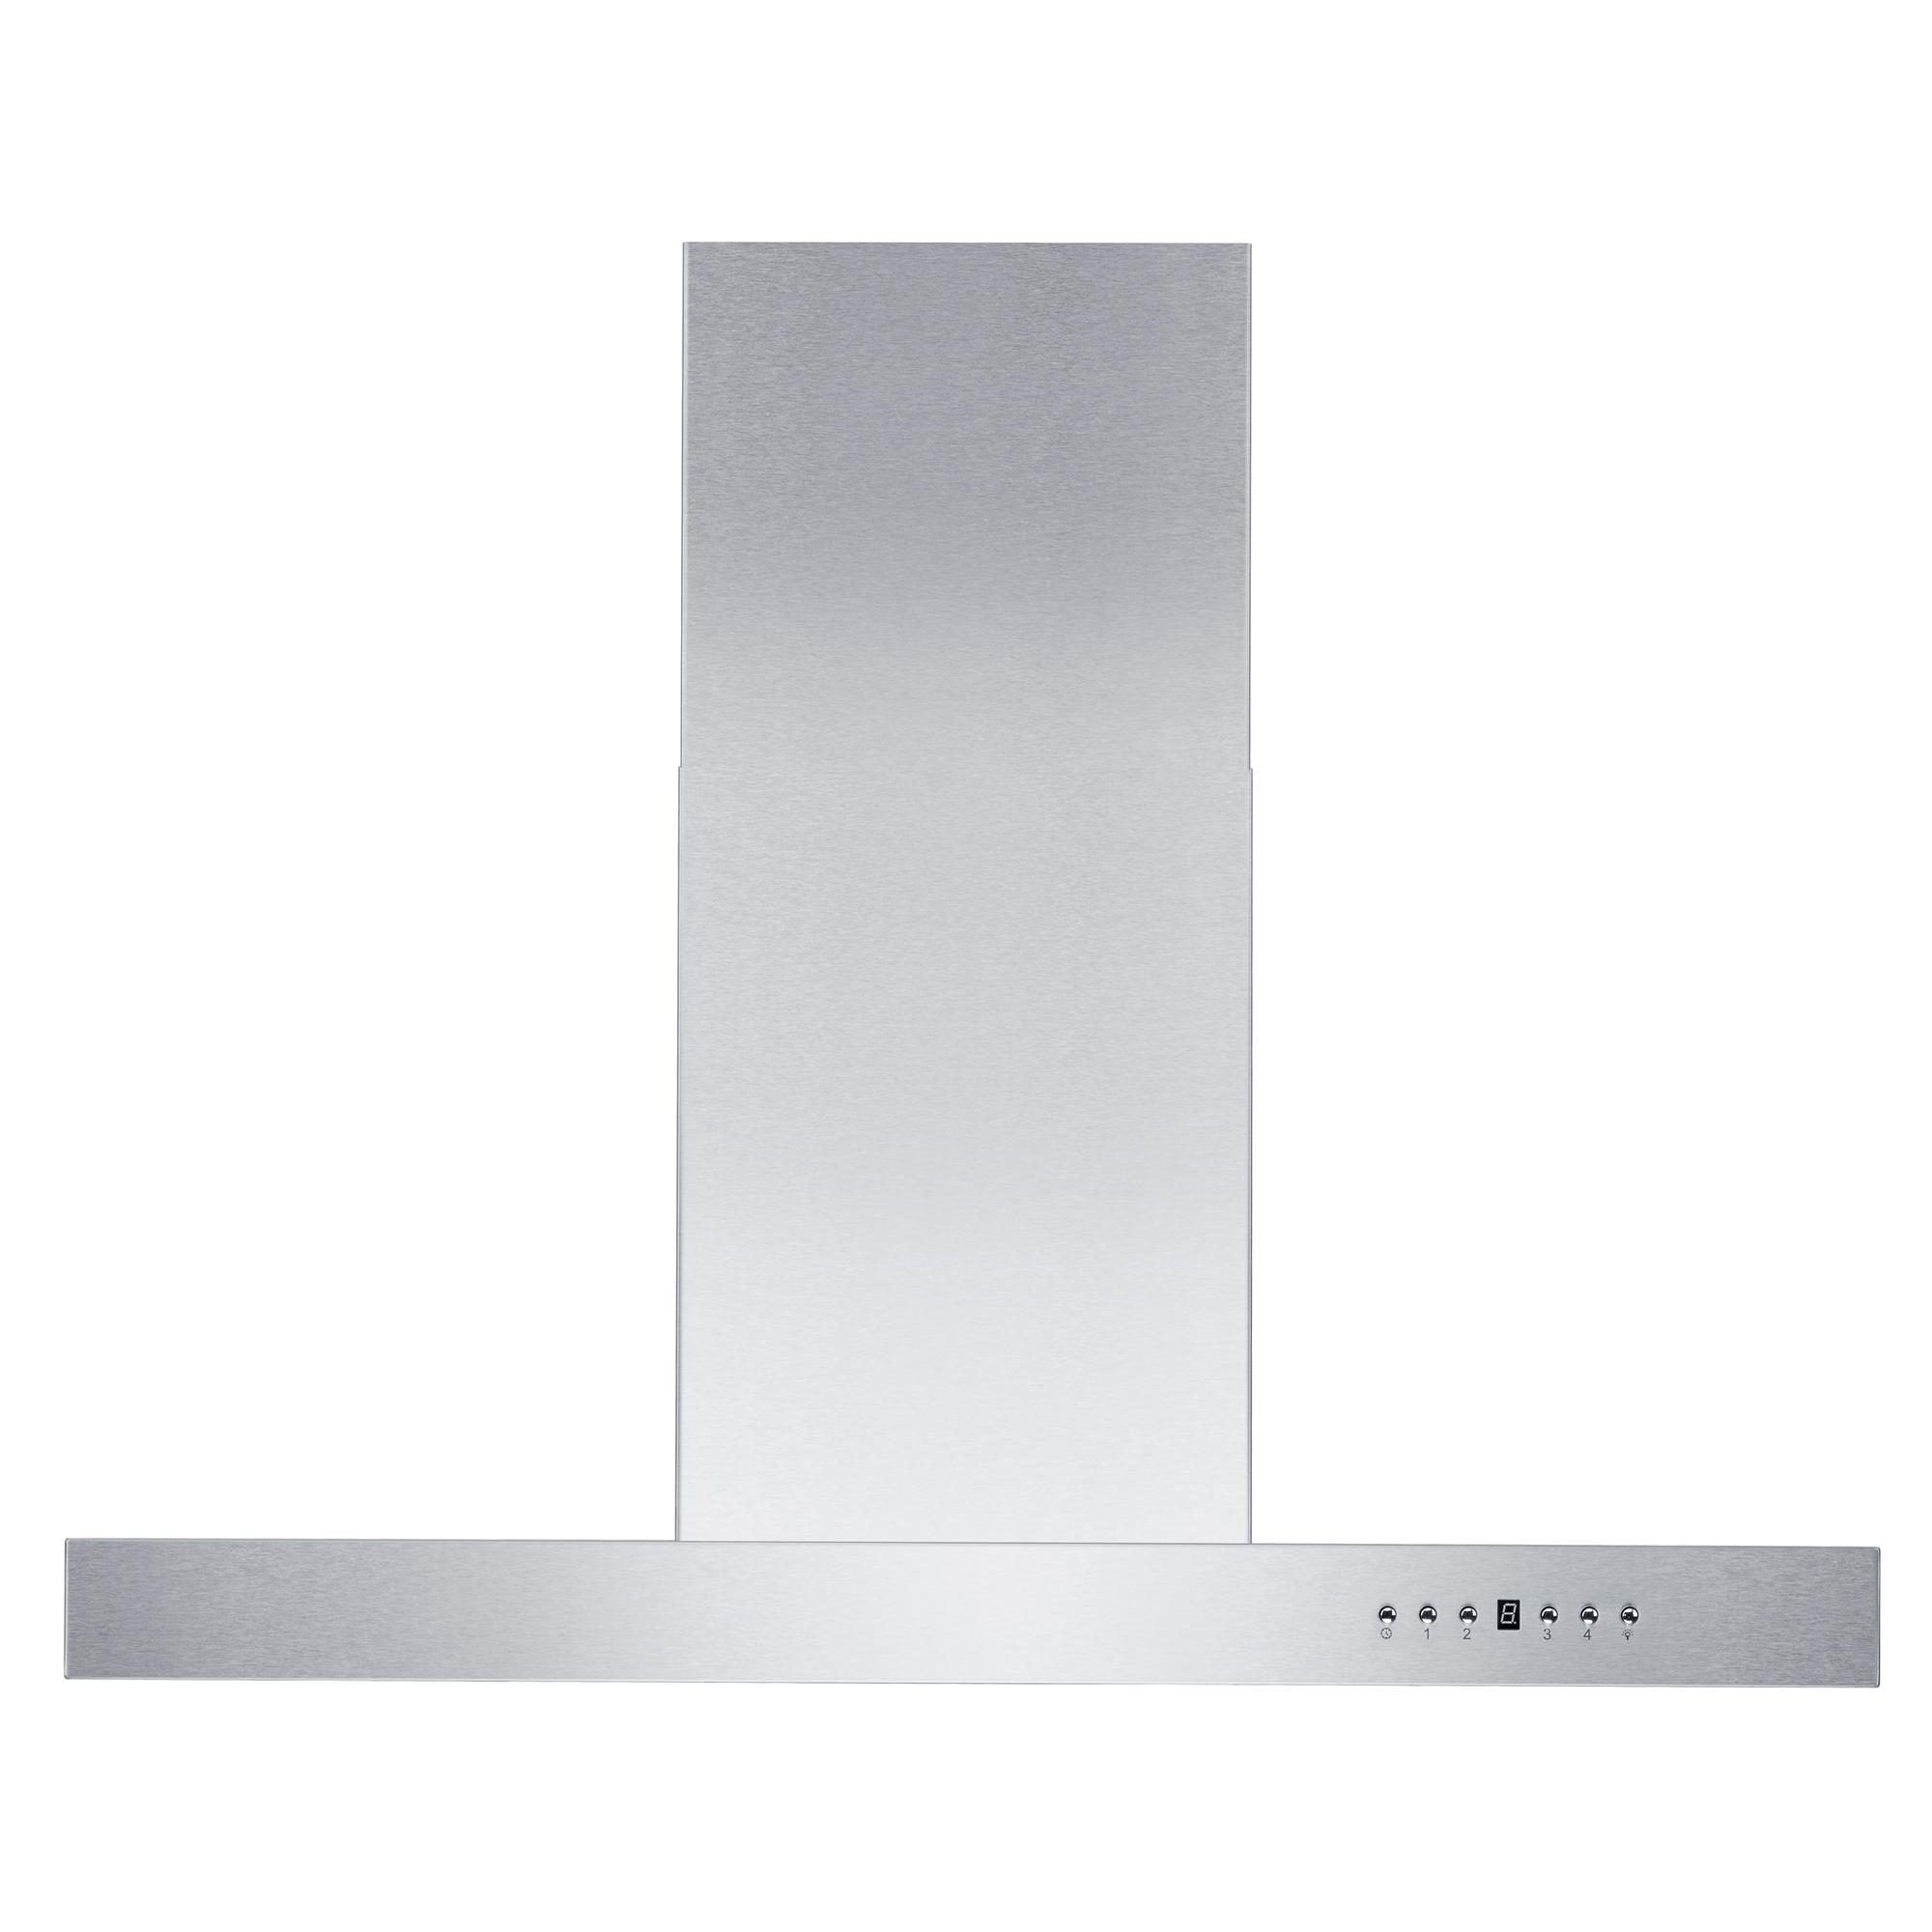 zline-stainless-steel-wall-mounted-range-hood-KE-new-front.jpg